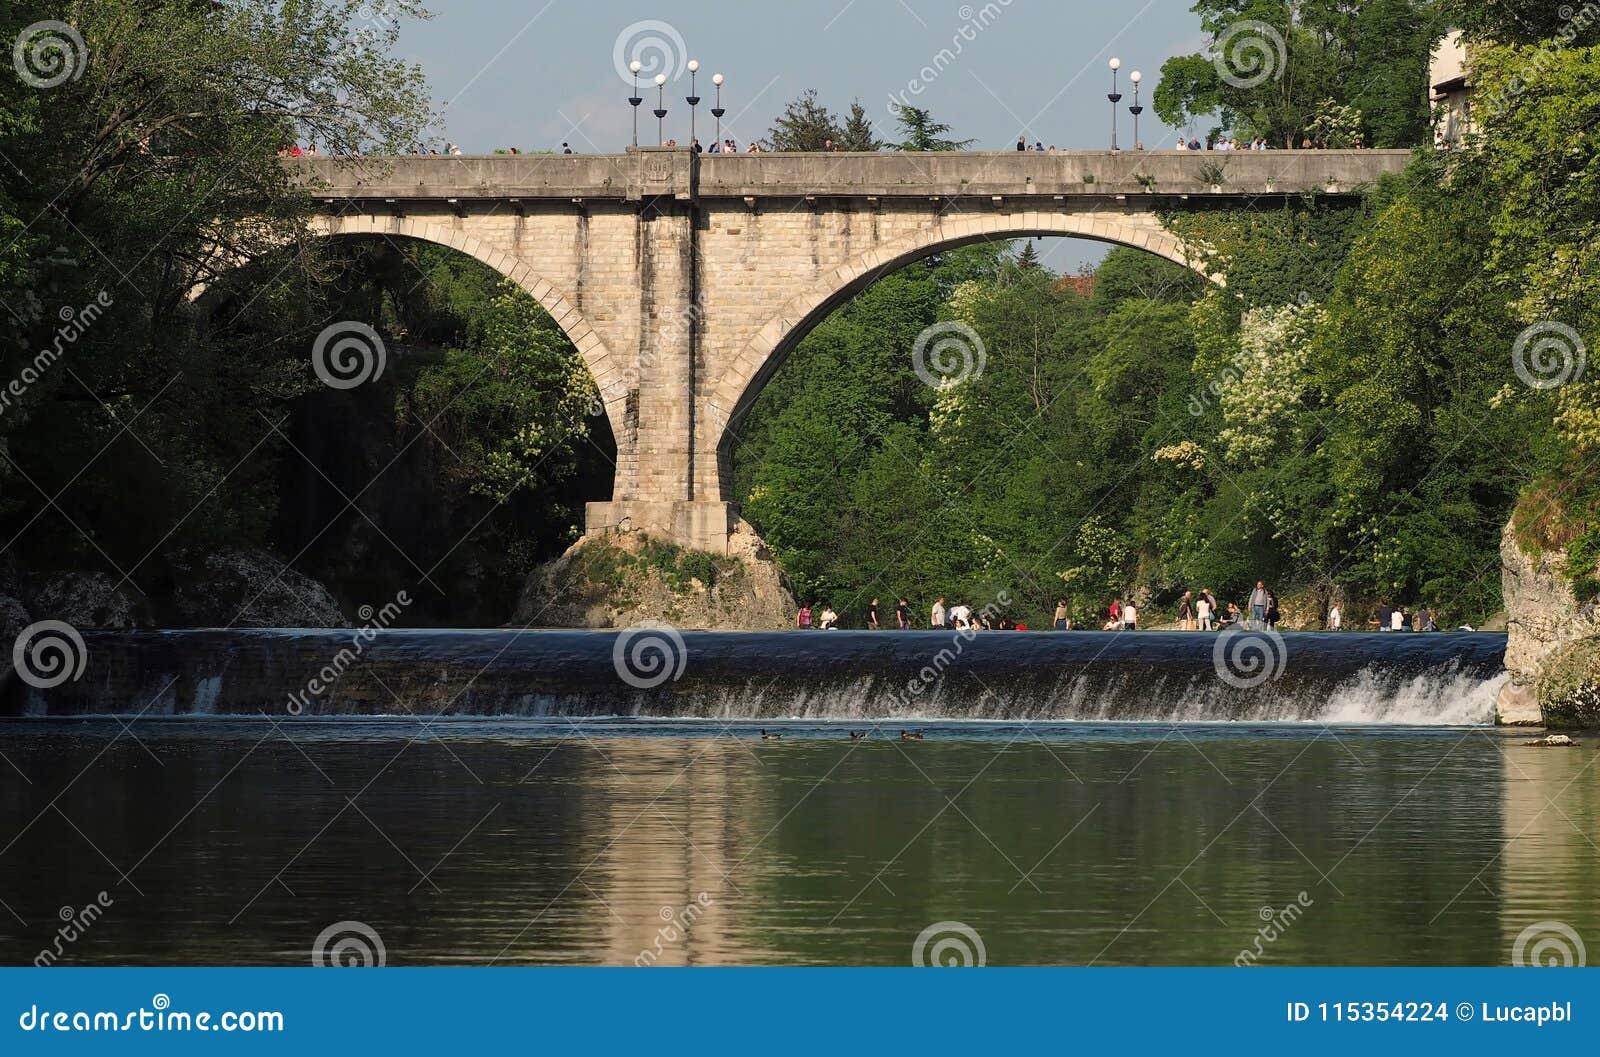 Cividale del Friuli/Ιταλία - 25 Απριλίου 2018: Η γέφυρα διαβόλων ` s στον ποταμό Natison με μερικούς ανθρώπους απολαμβάνει τον ήλ